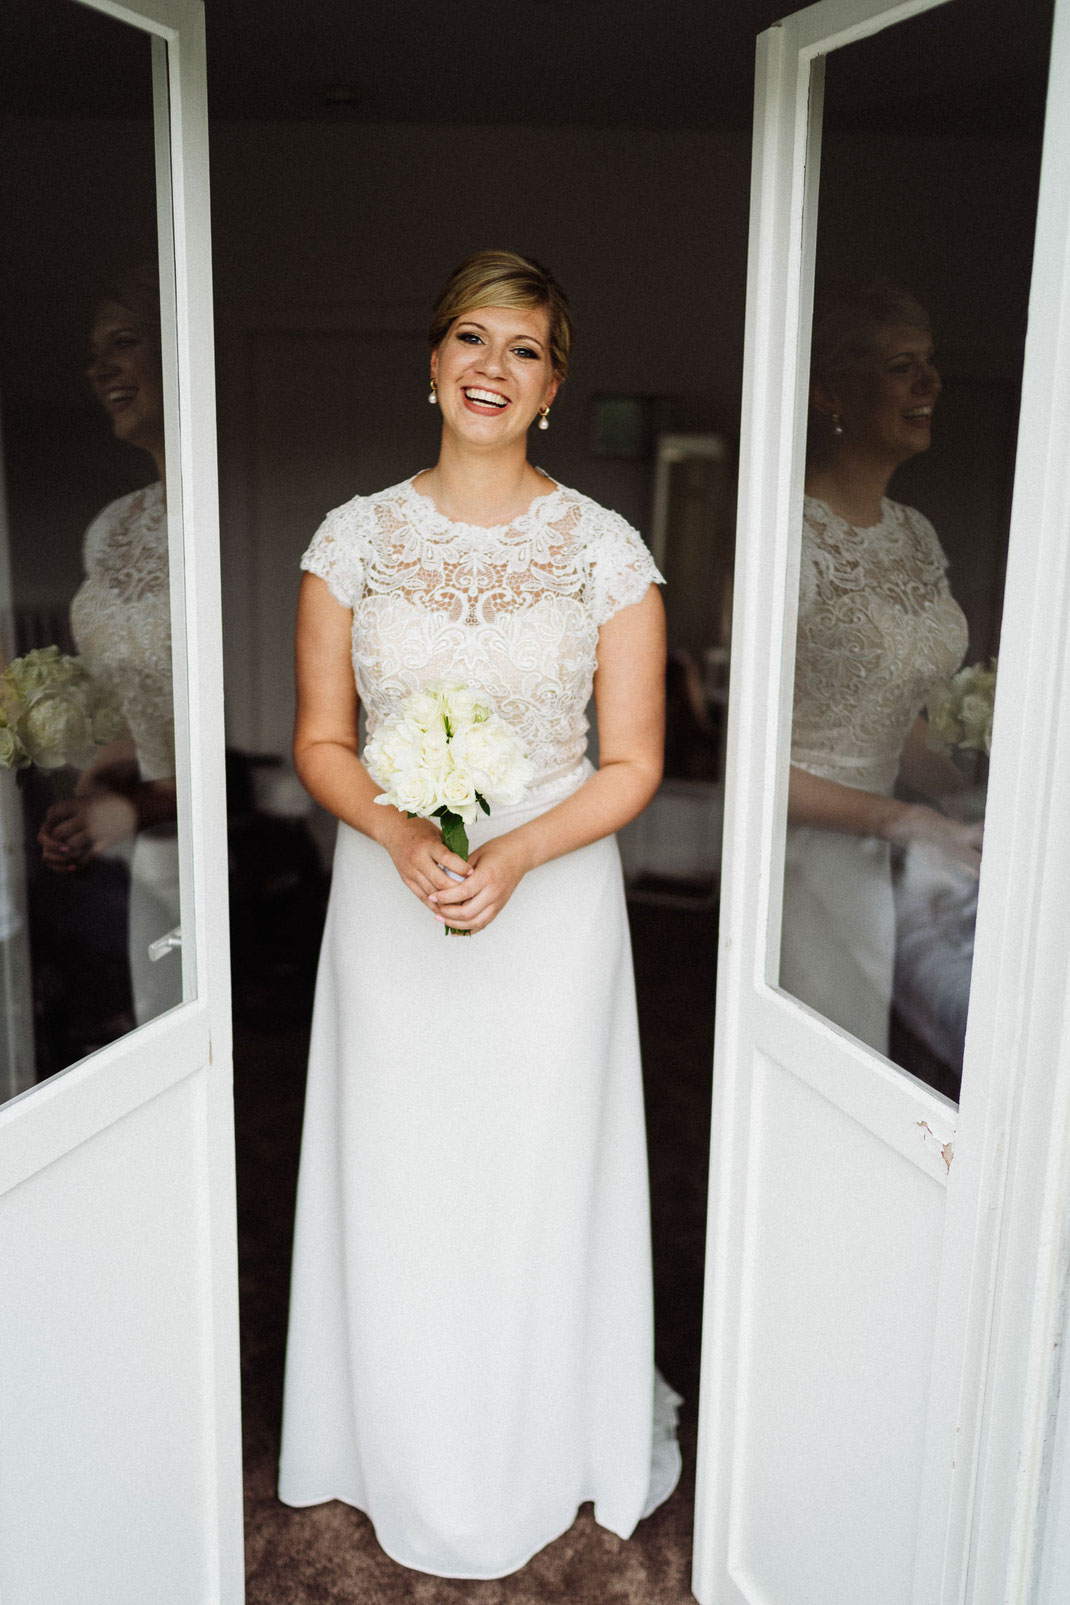 Braut Fenster Tür Balkon hübsch